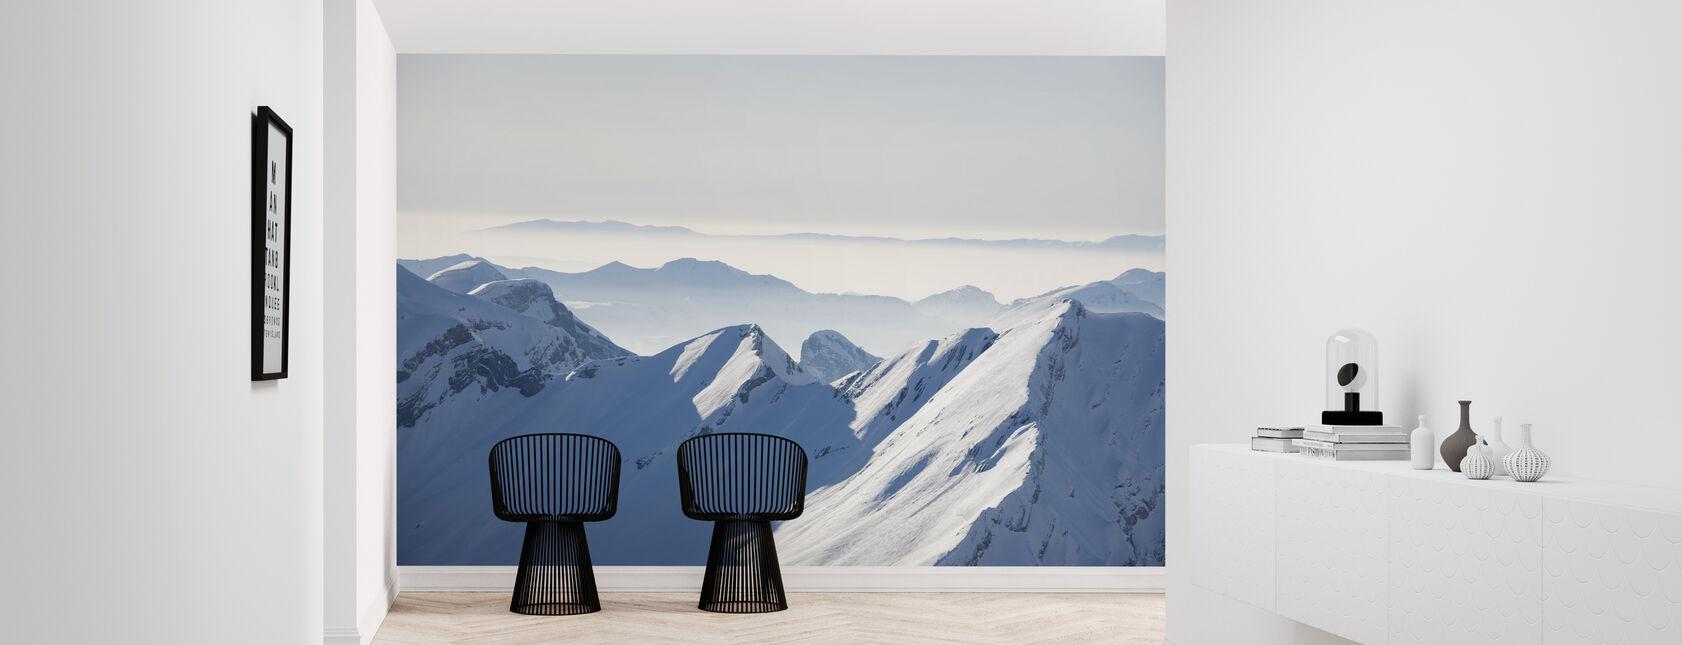 Chamonix Alpit I, Ranska - Tapetti - Aula